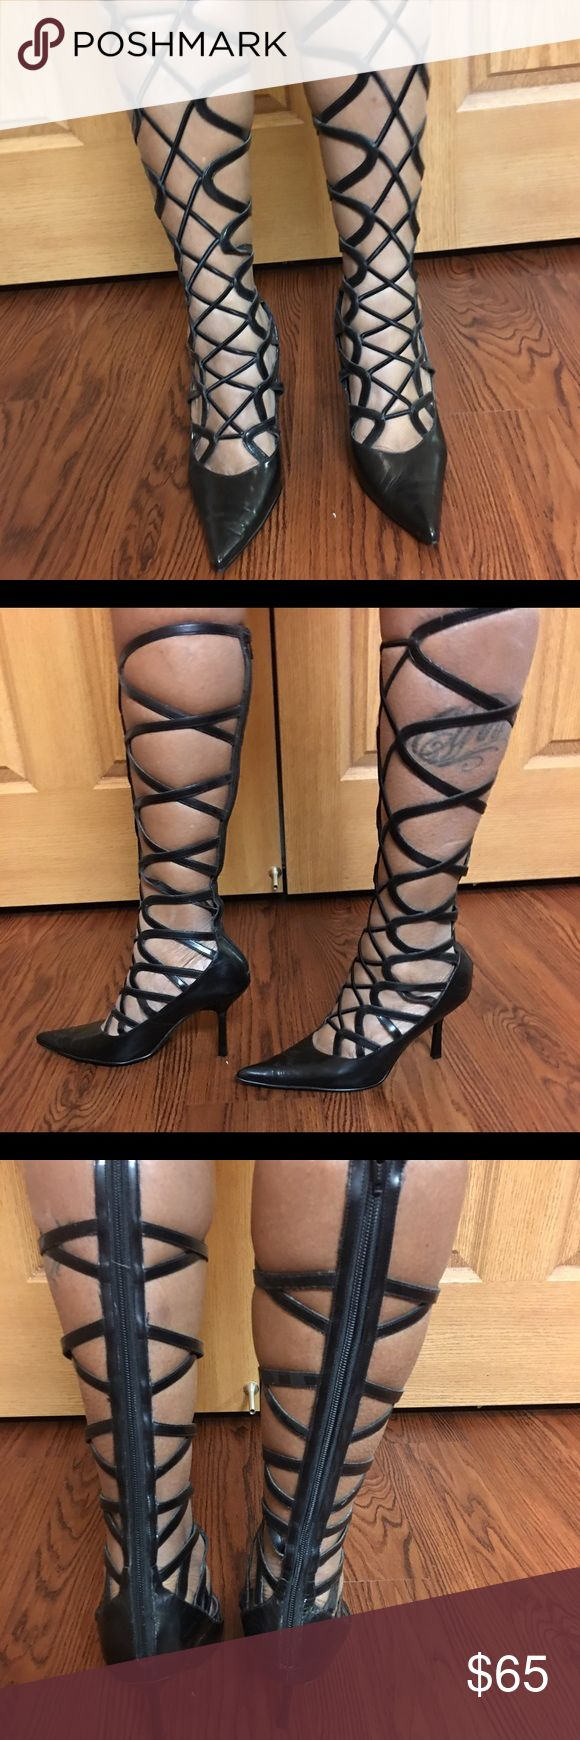 1000  ideas about Gladiator Heels on Pinterest | Sexy heels ...